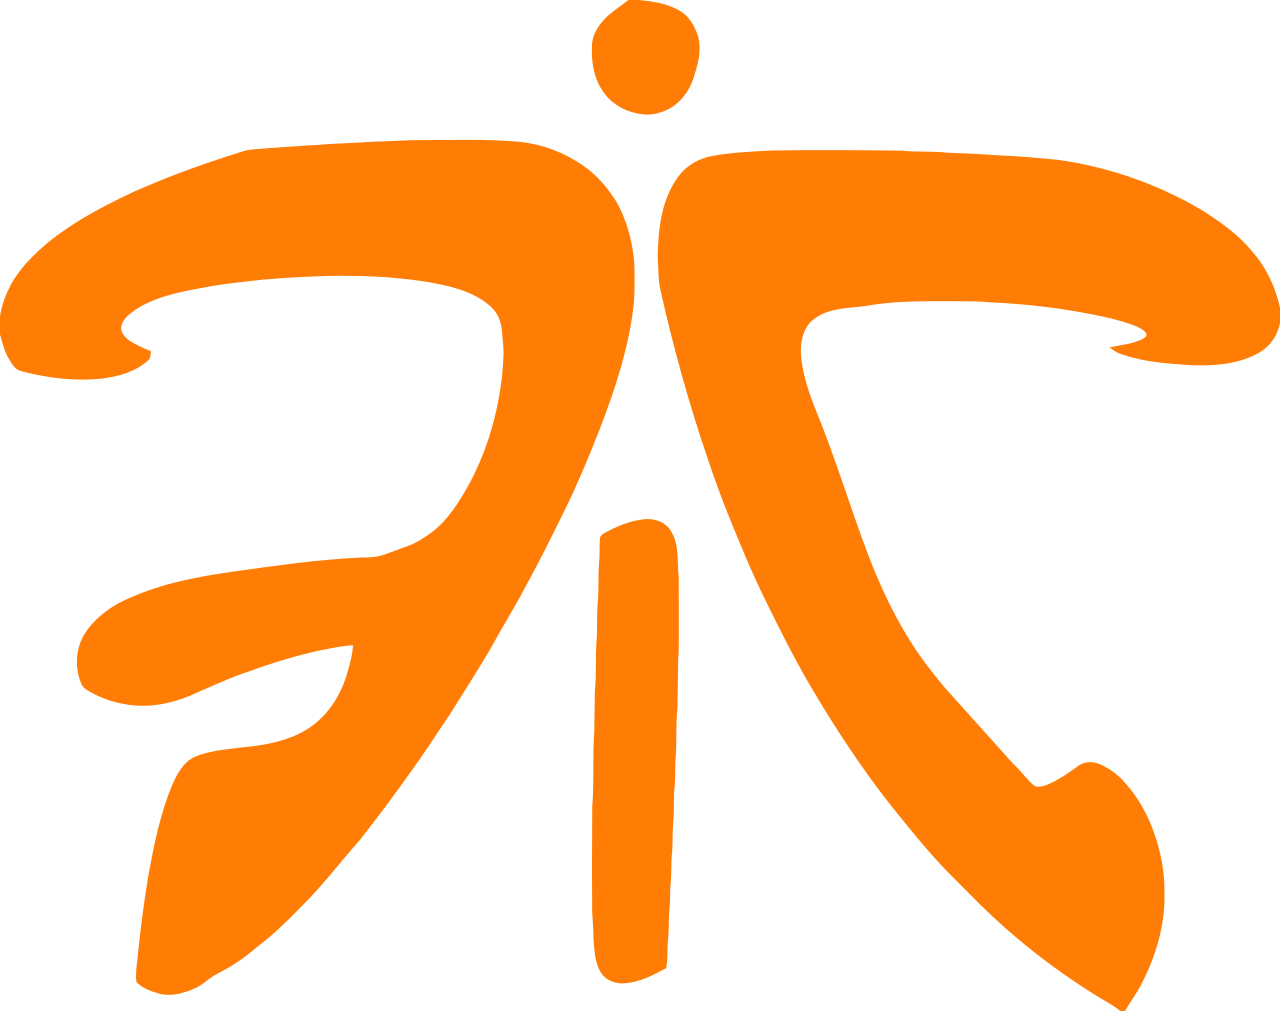 Eu Lcs Fnatic Logo Logos Lol Teams Rocket League Logo